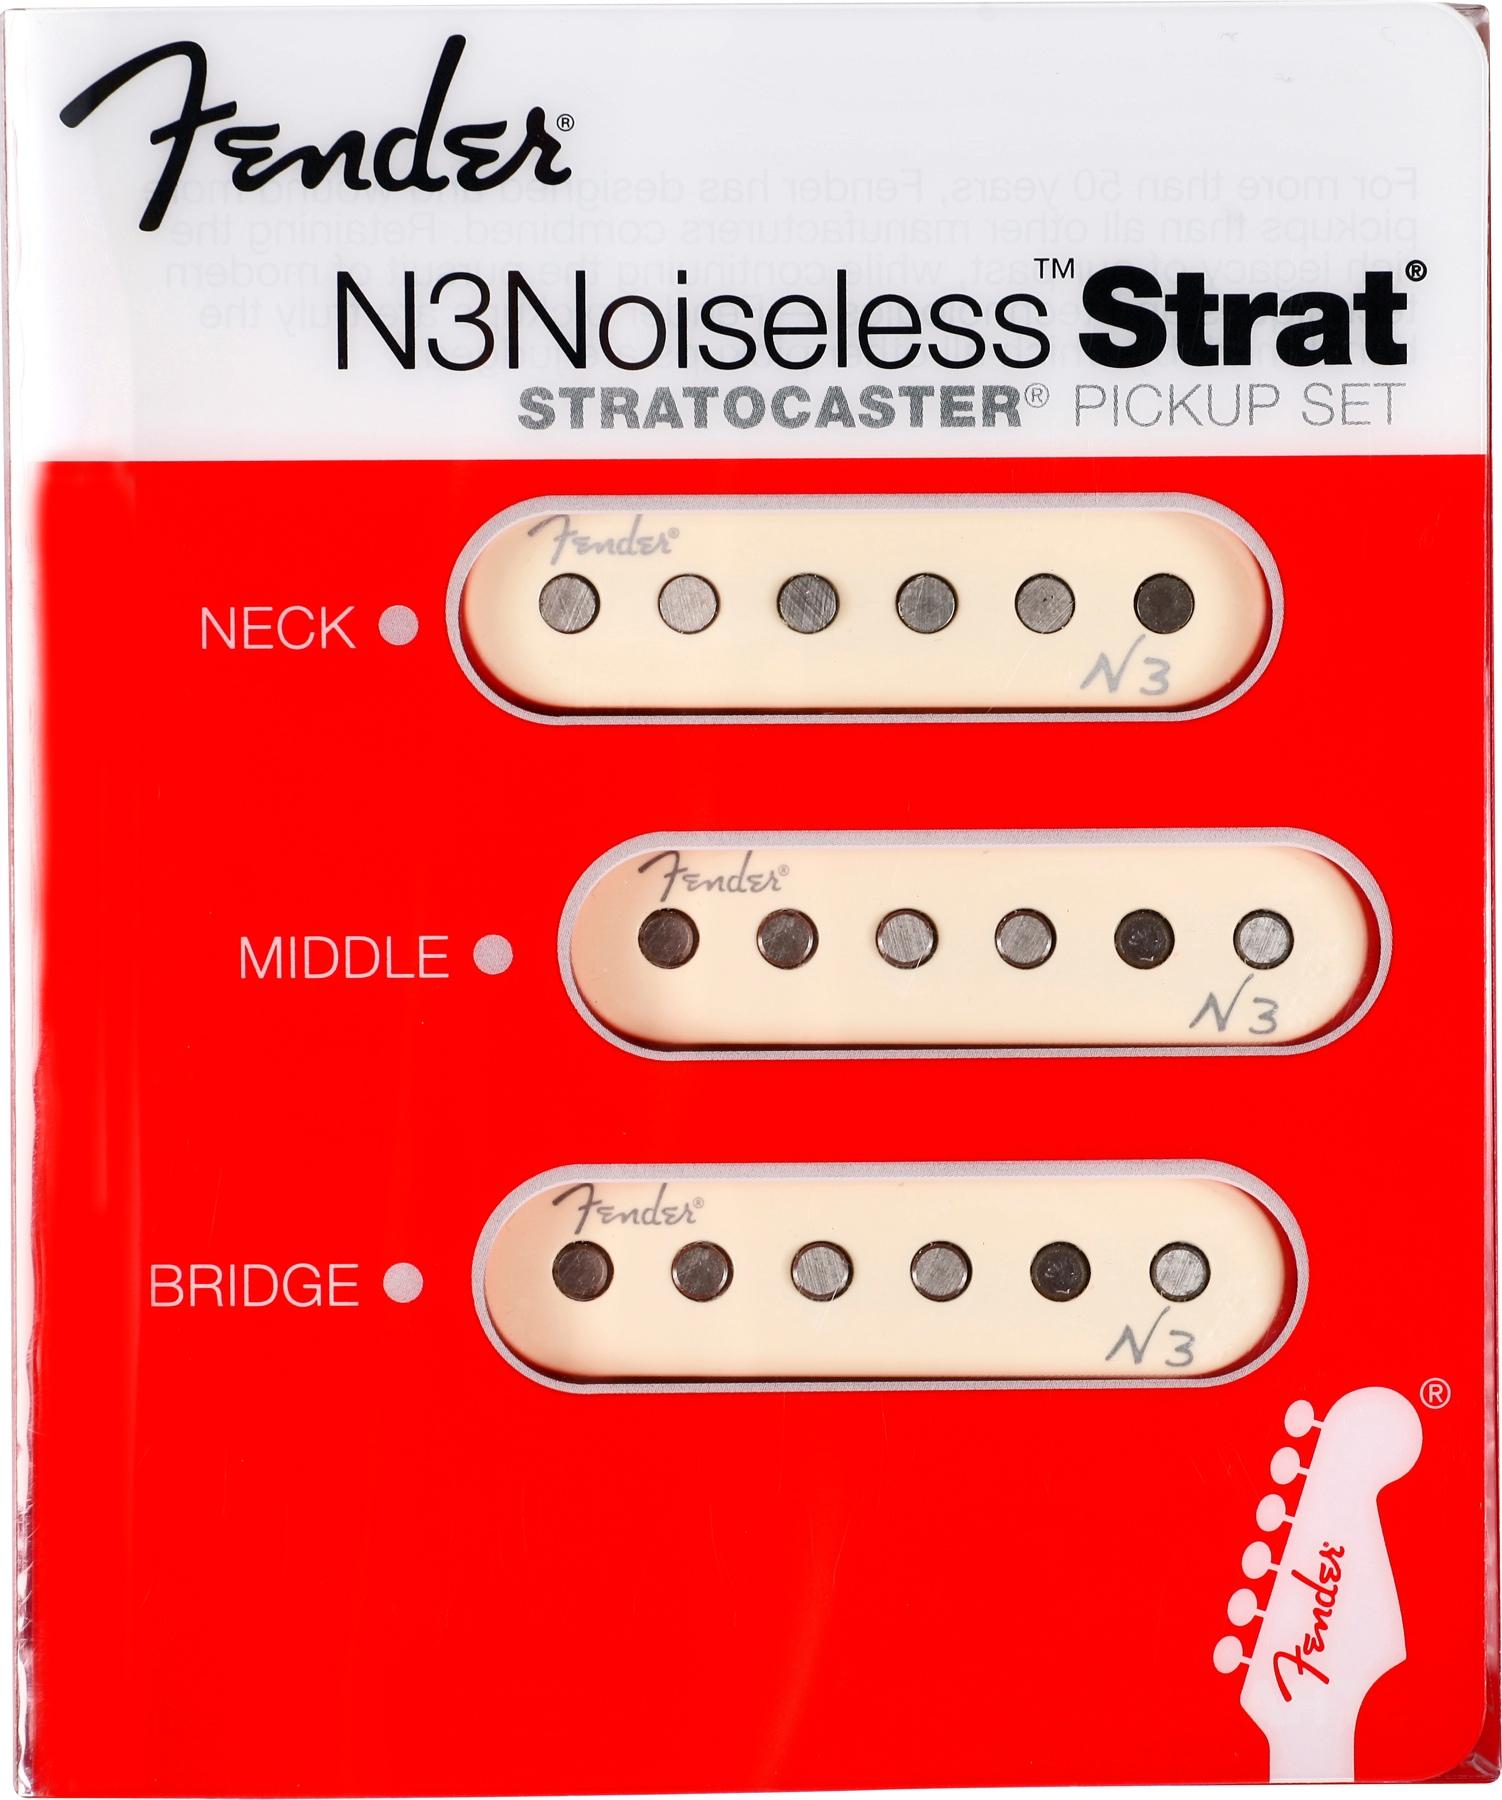 Atemberaubend Fender N3 Pickups Stratocaster Schaltplan Fotos ...